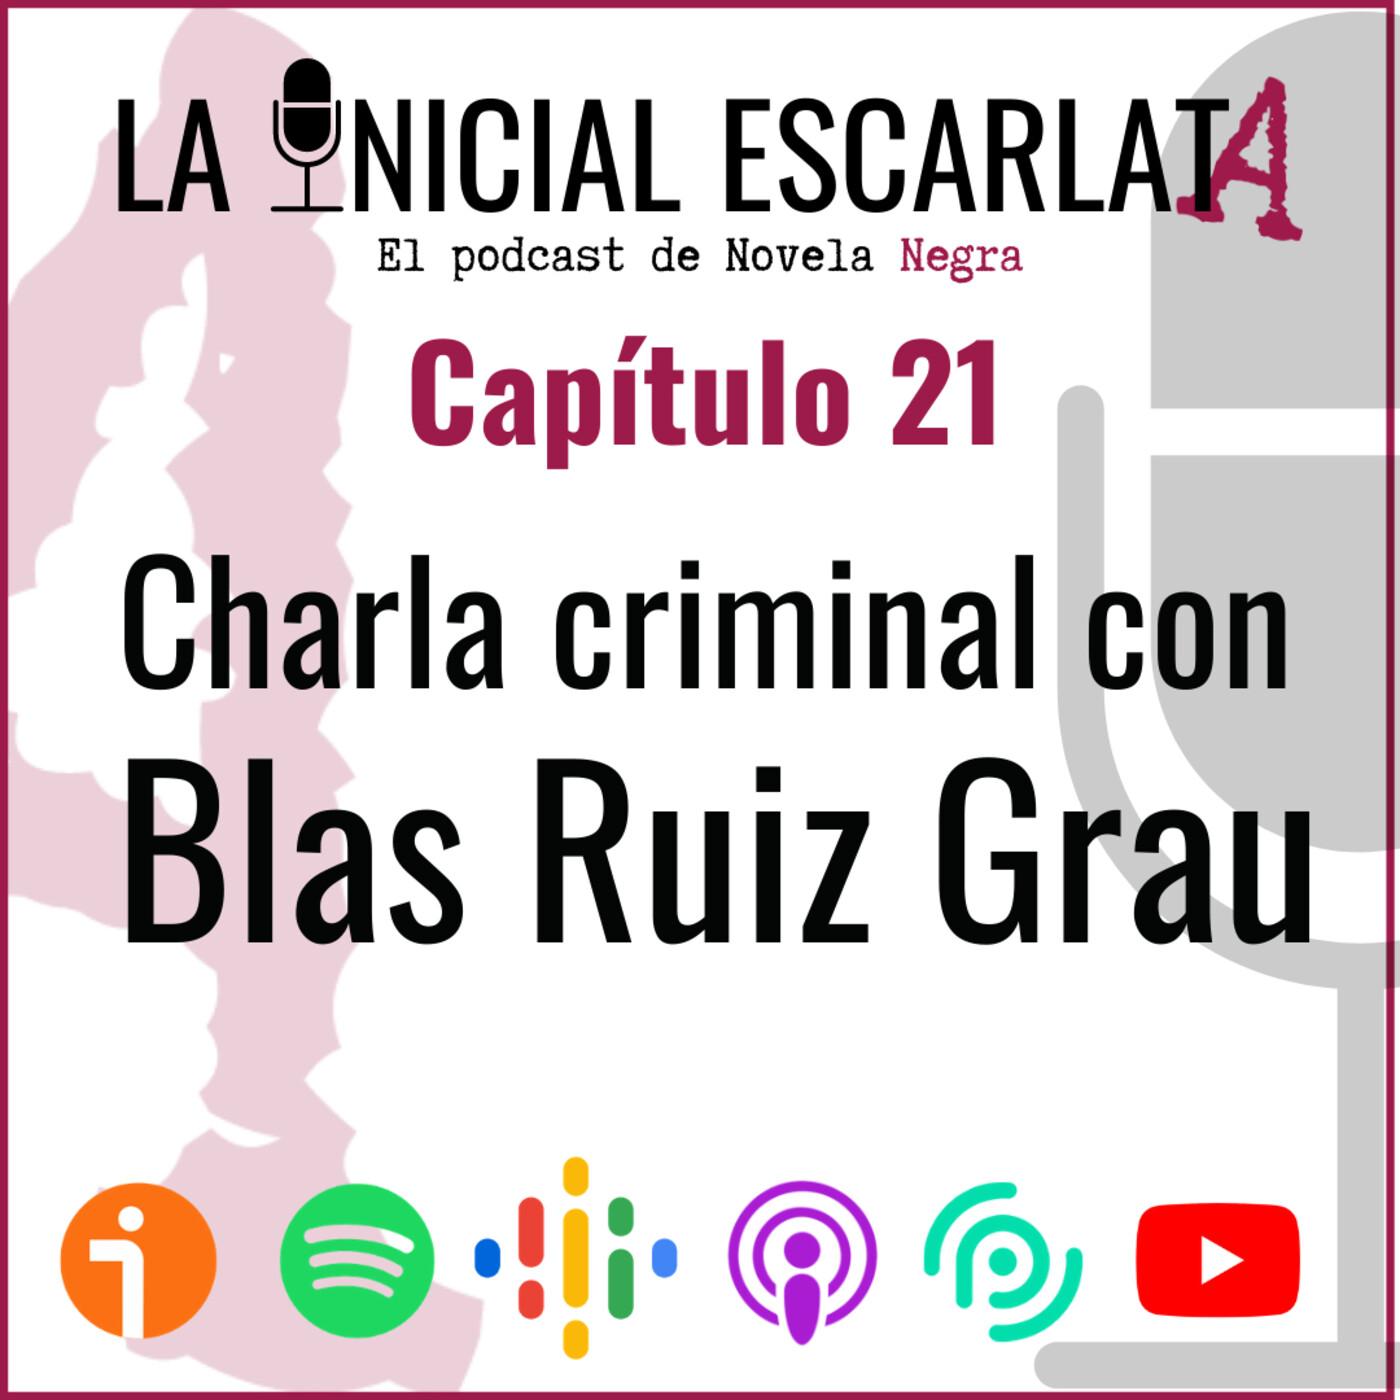 Capítulo 21: Charla criminal con Blas Ruiz Grau (@blasruizgrau)